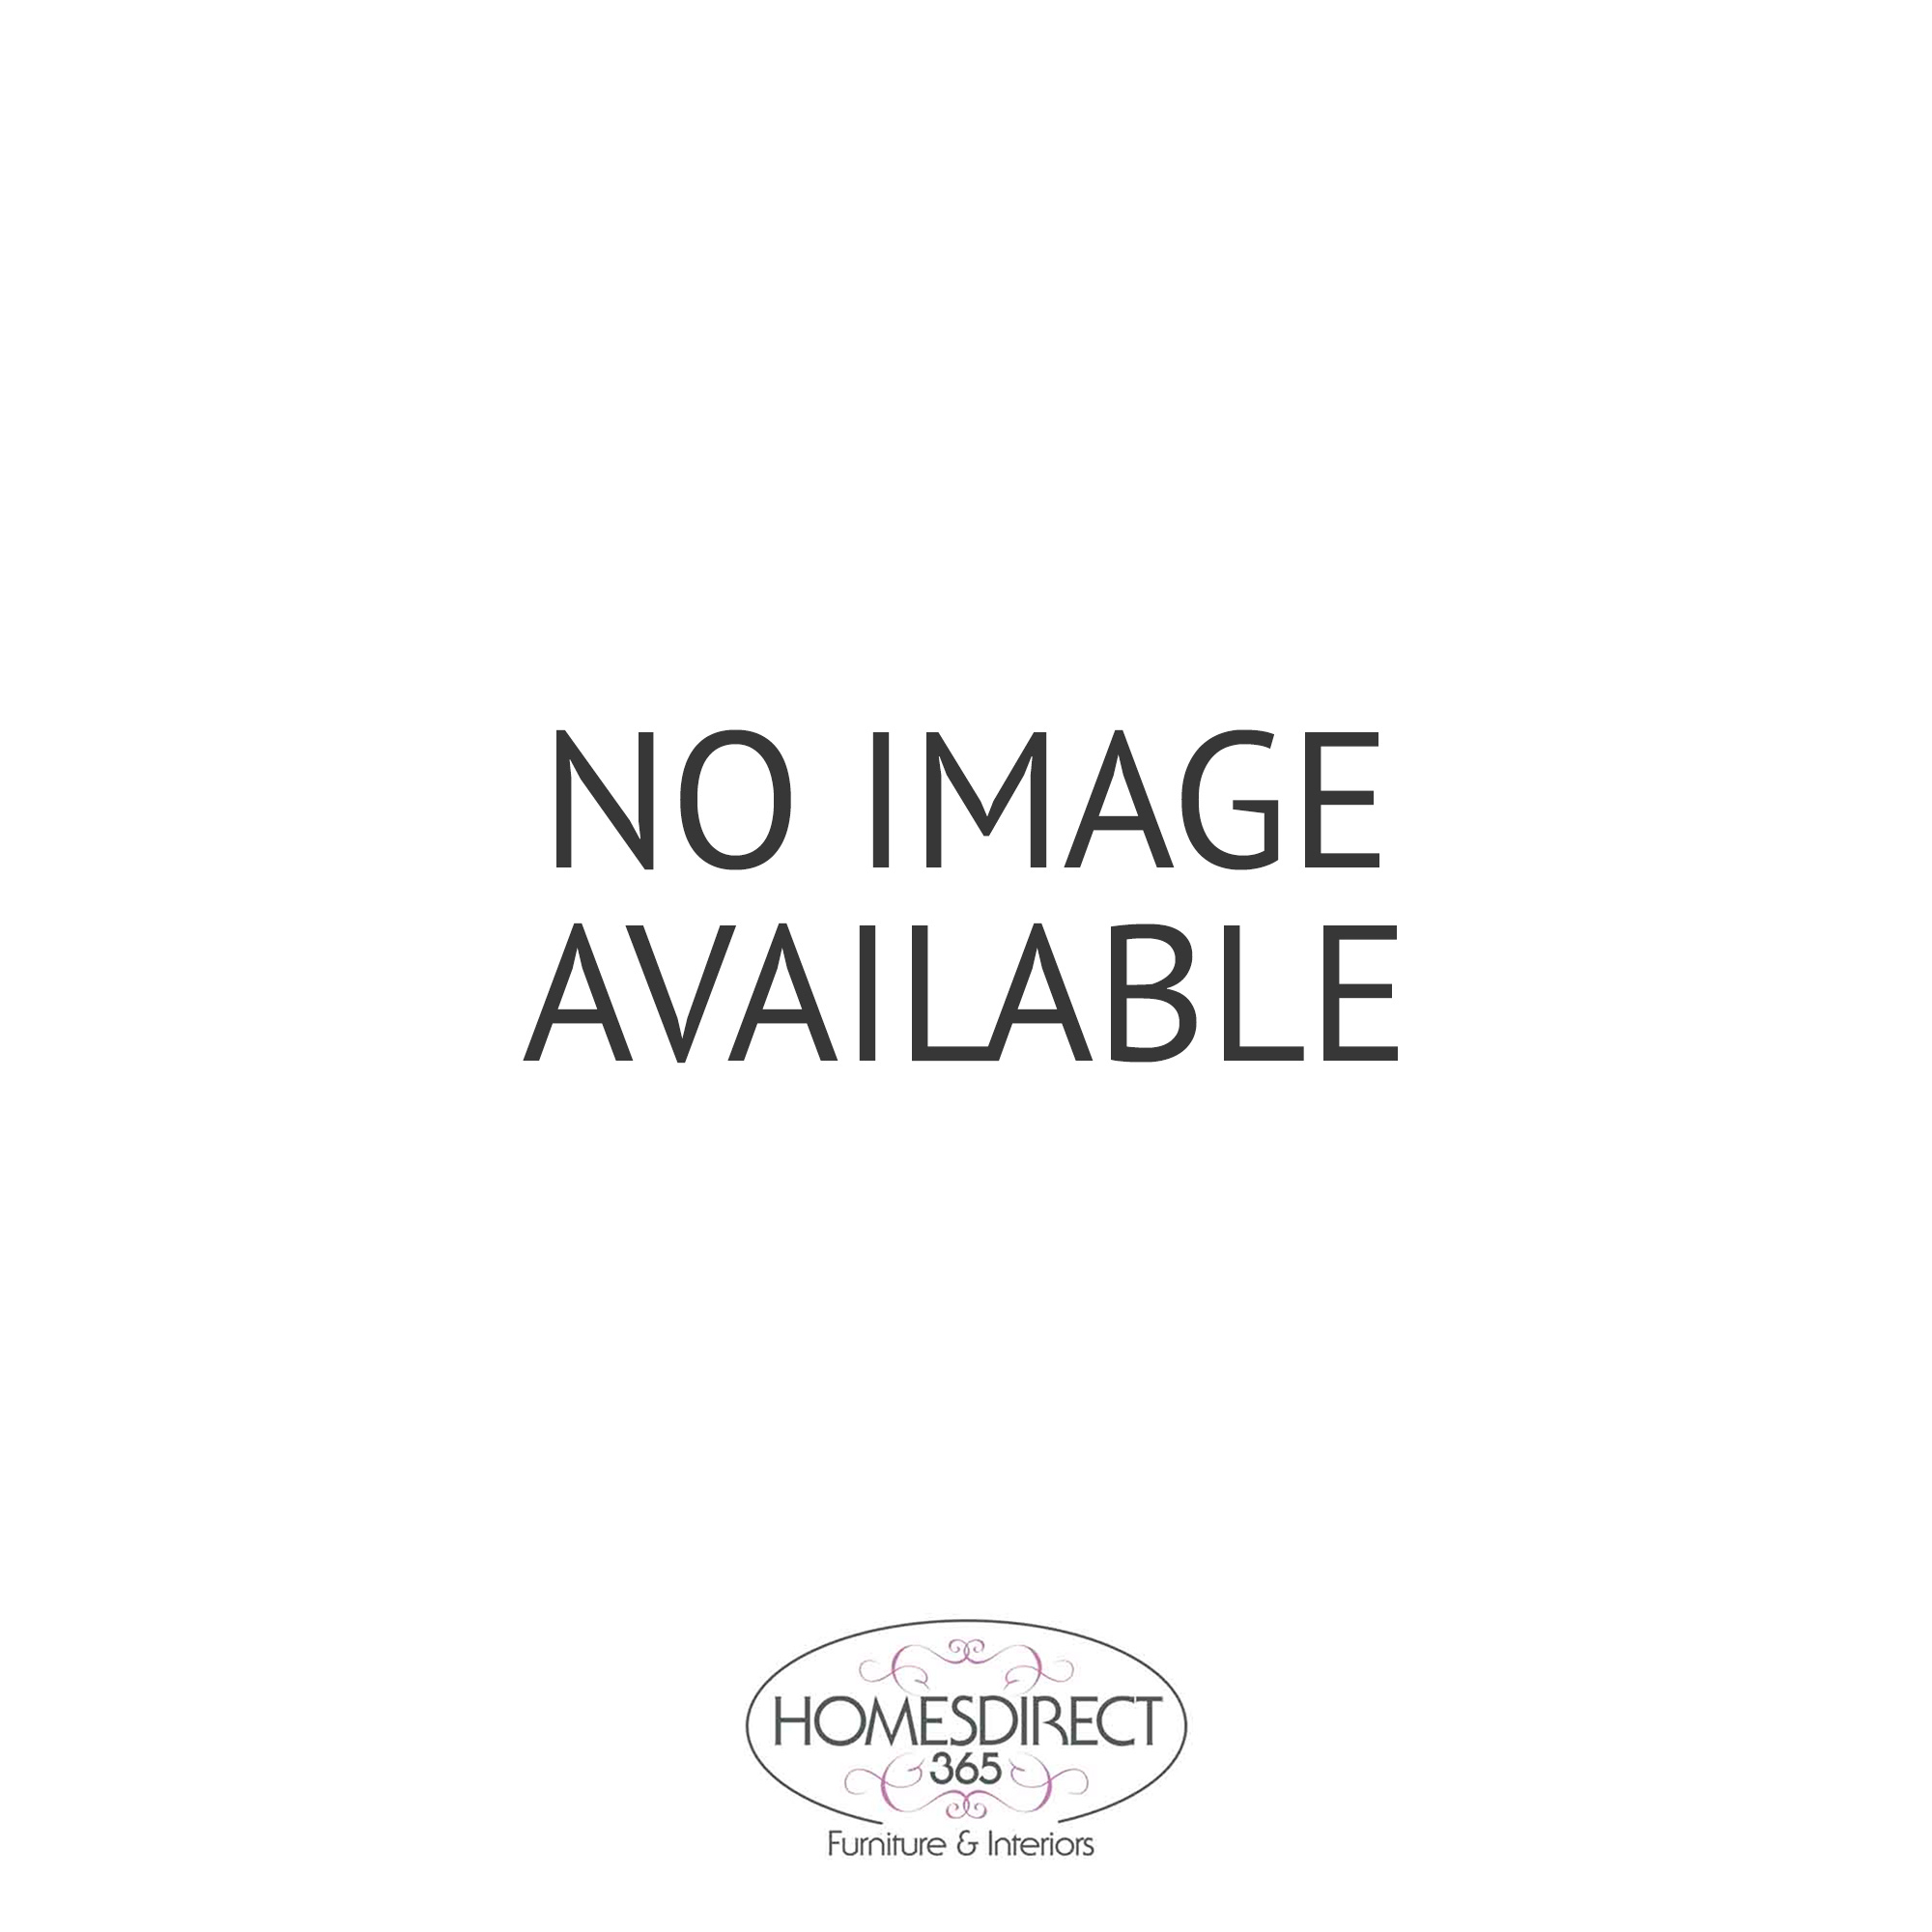 ebf81b6fbe14bd Pippa Grey Fabric Bed | Fabric | HomesDirect365